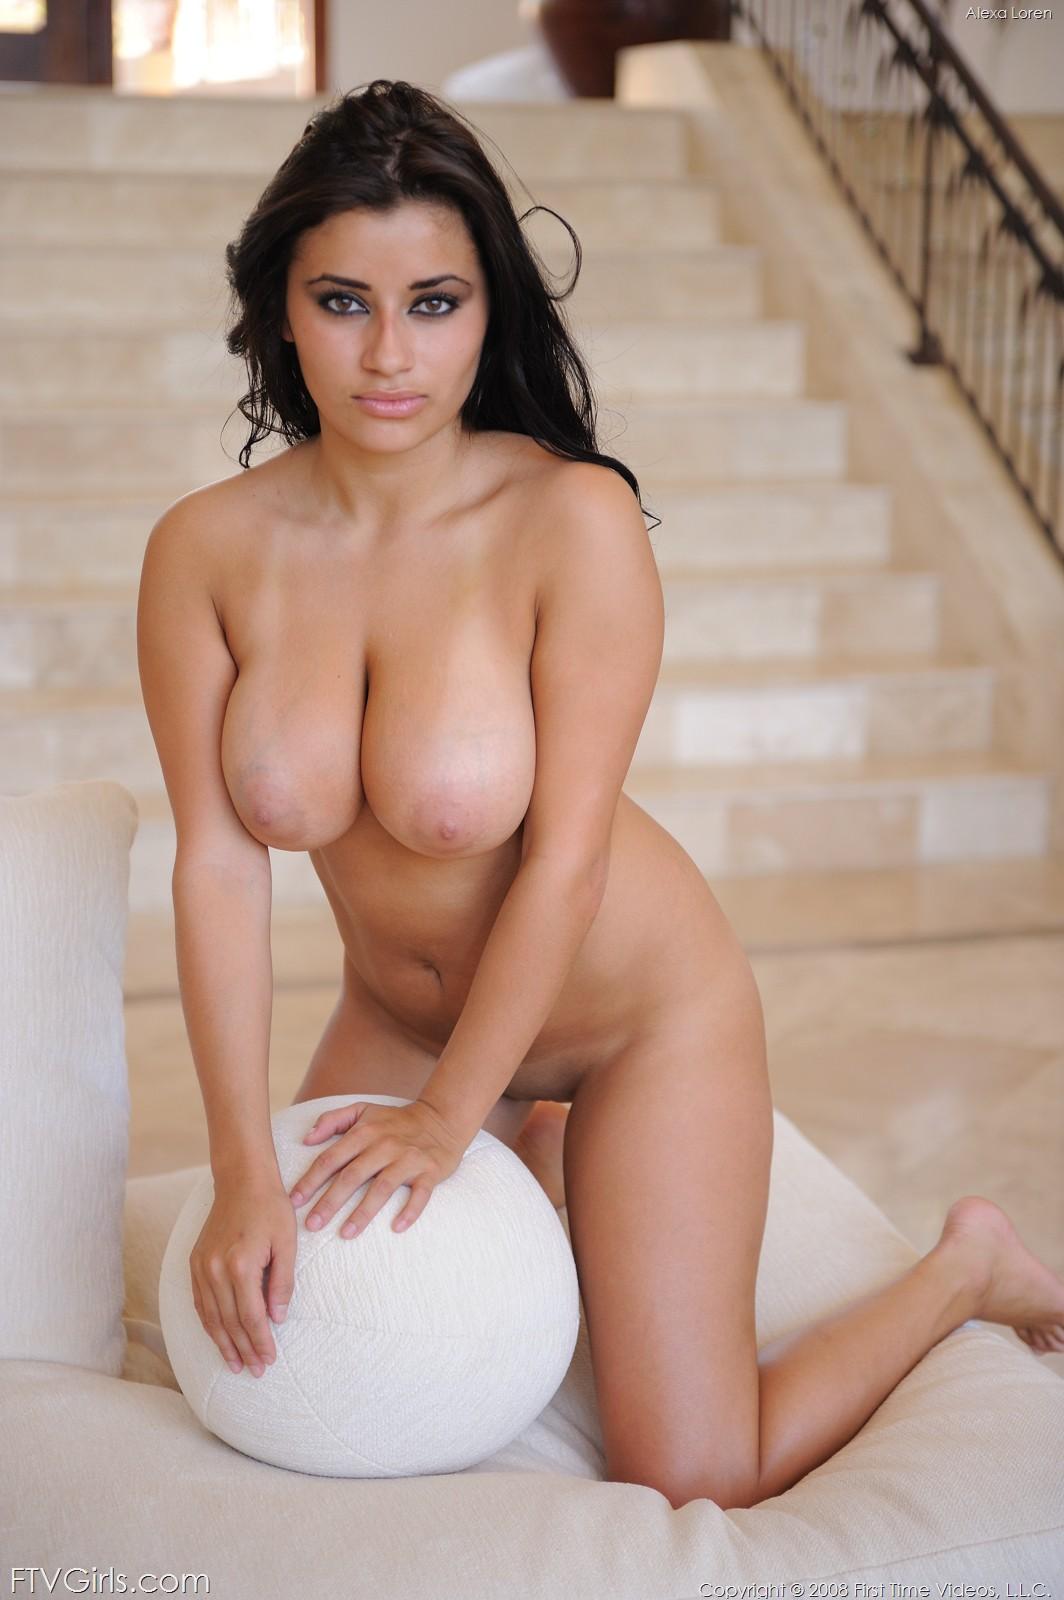 Alexa latina nude pics